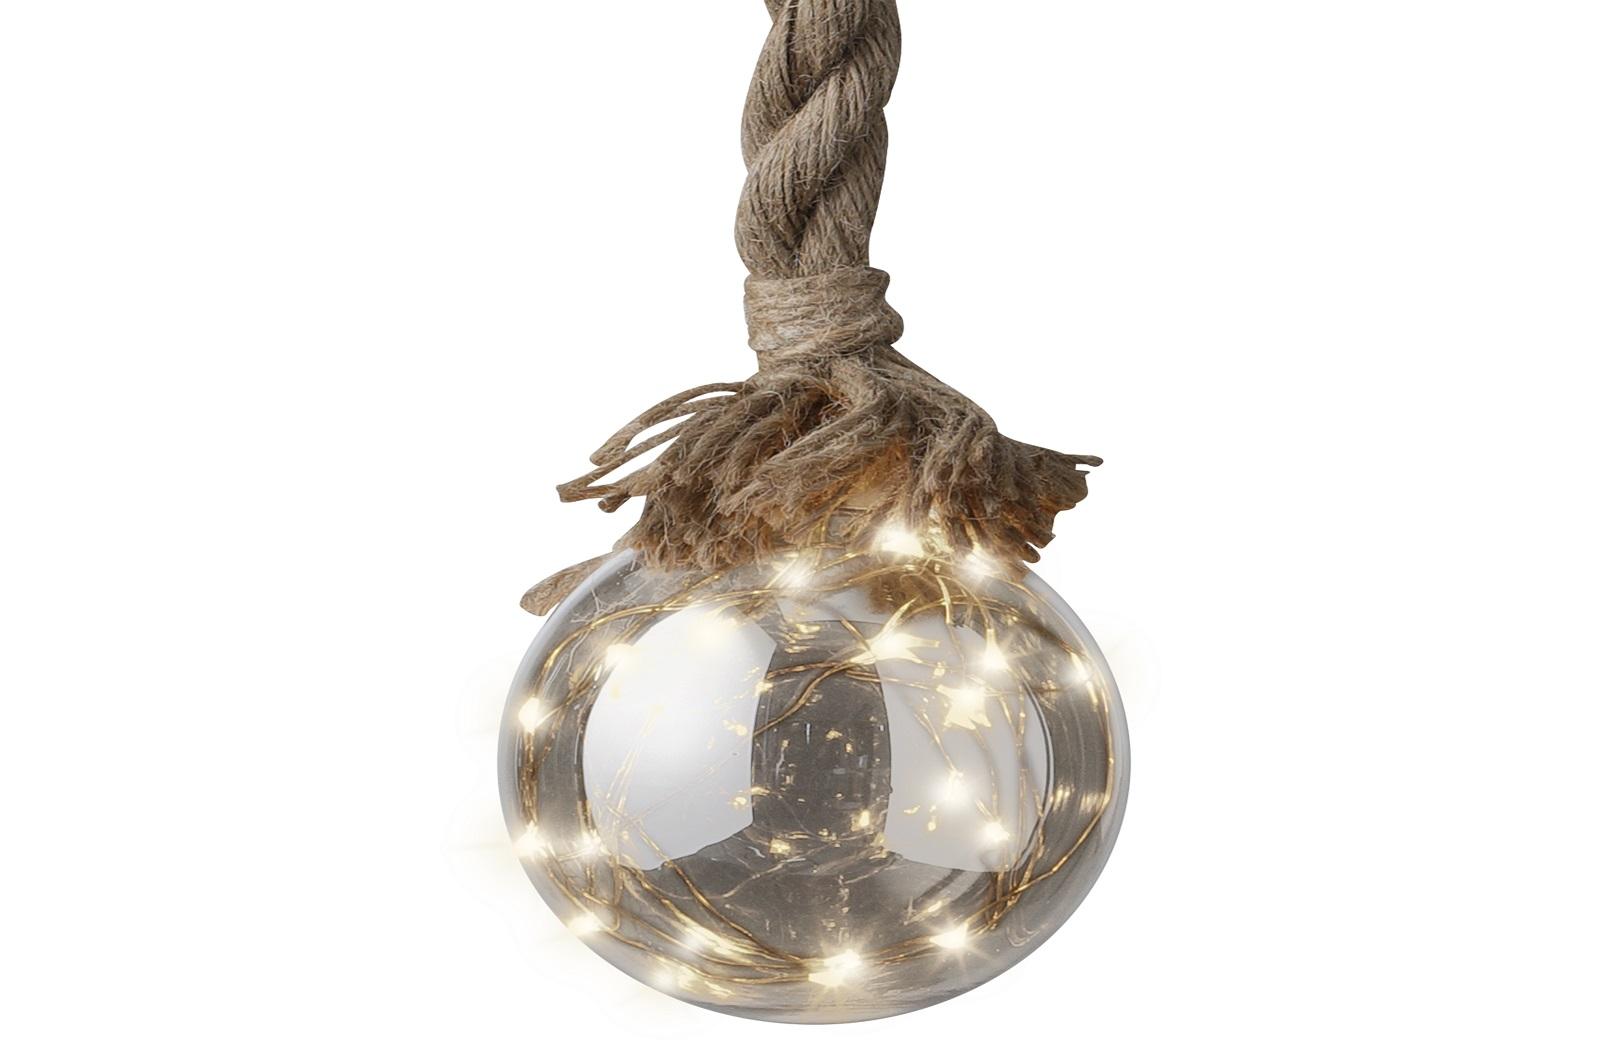 Mico-LED Kugel aus Glas mit Seil  Dekohänger